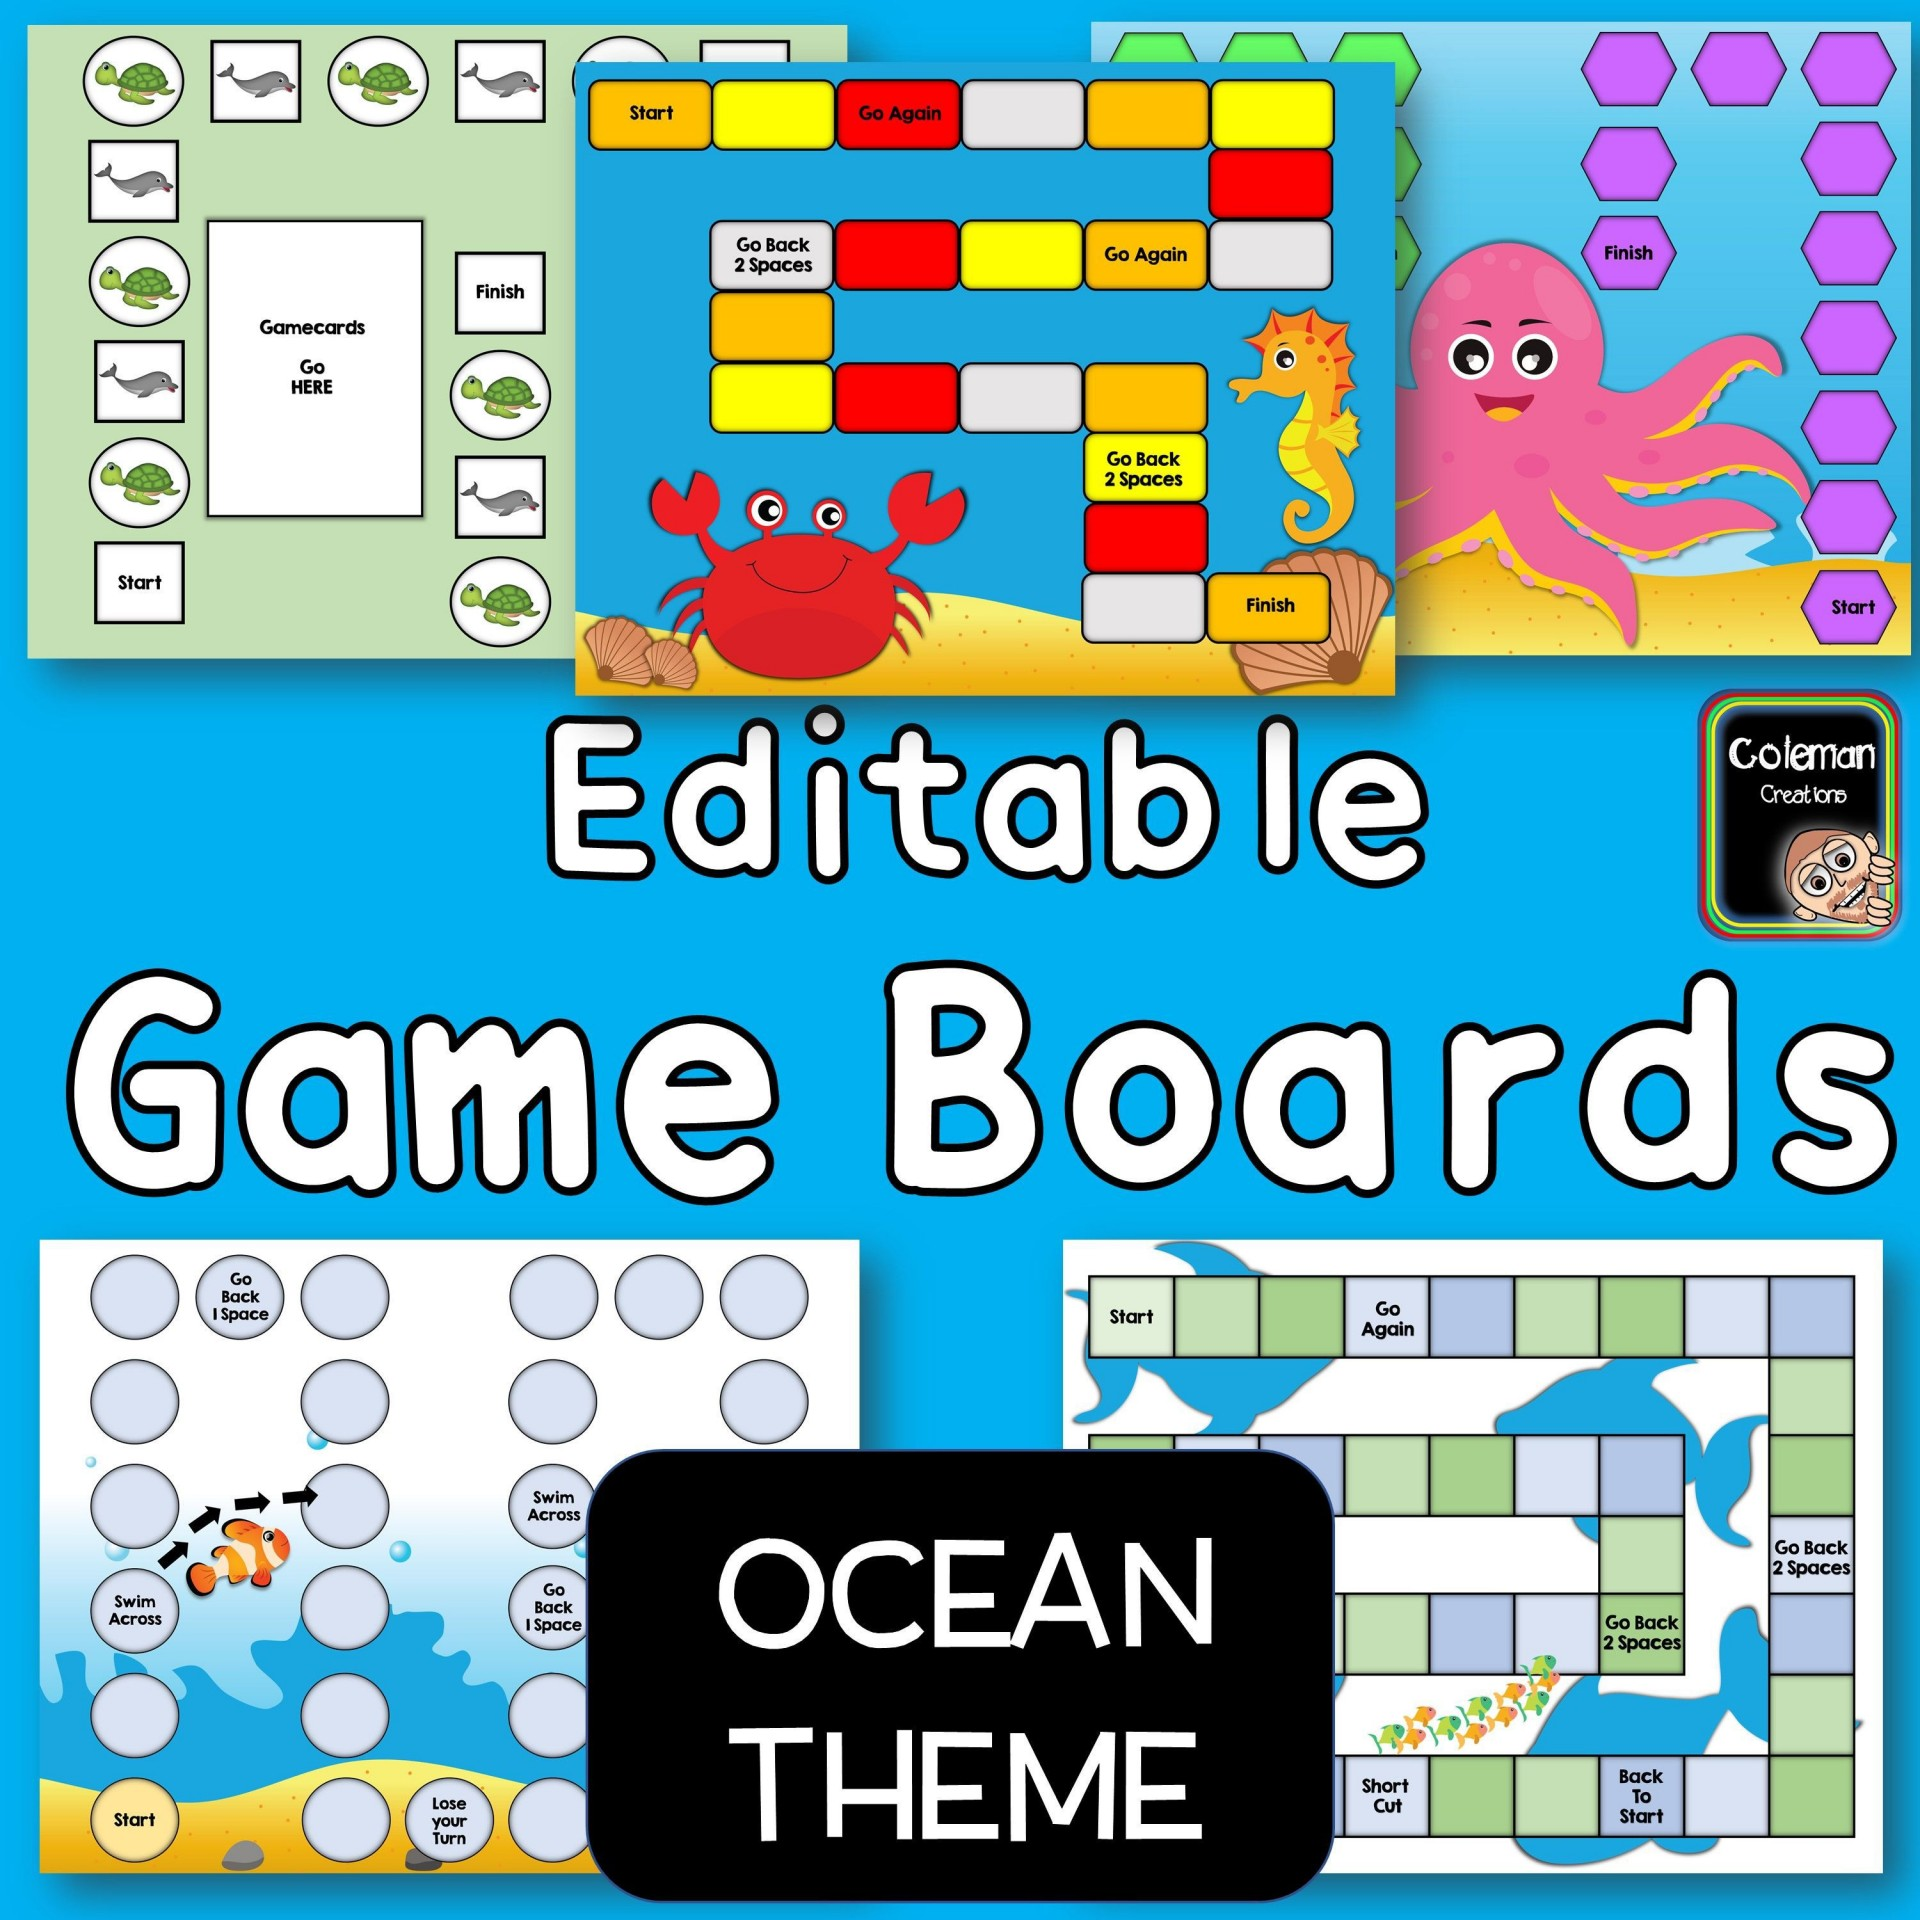 000 Striking Editable Board Game Template Inspiration  Word Blank Free1920